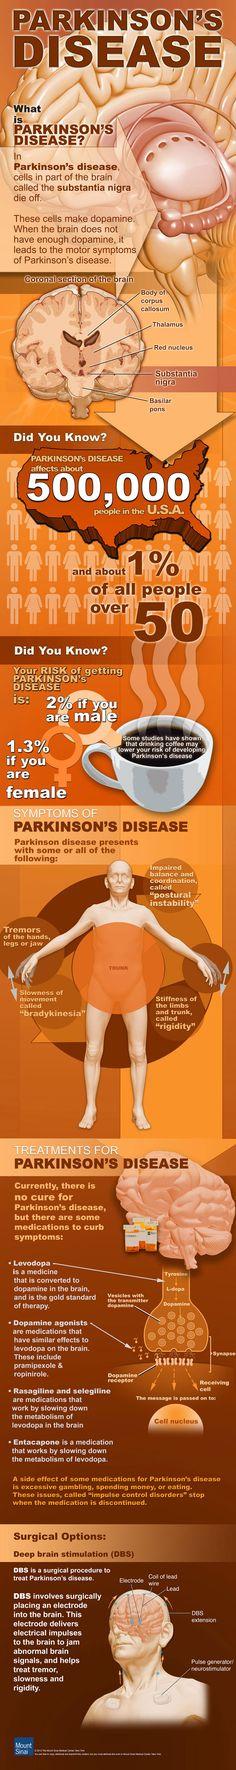 #Parkinsons Disease #Infographic